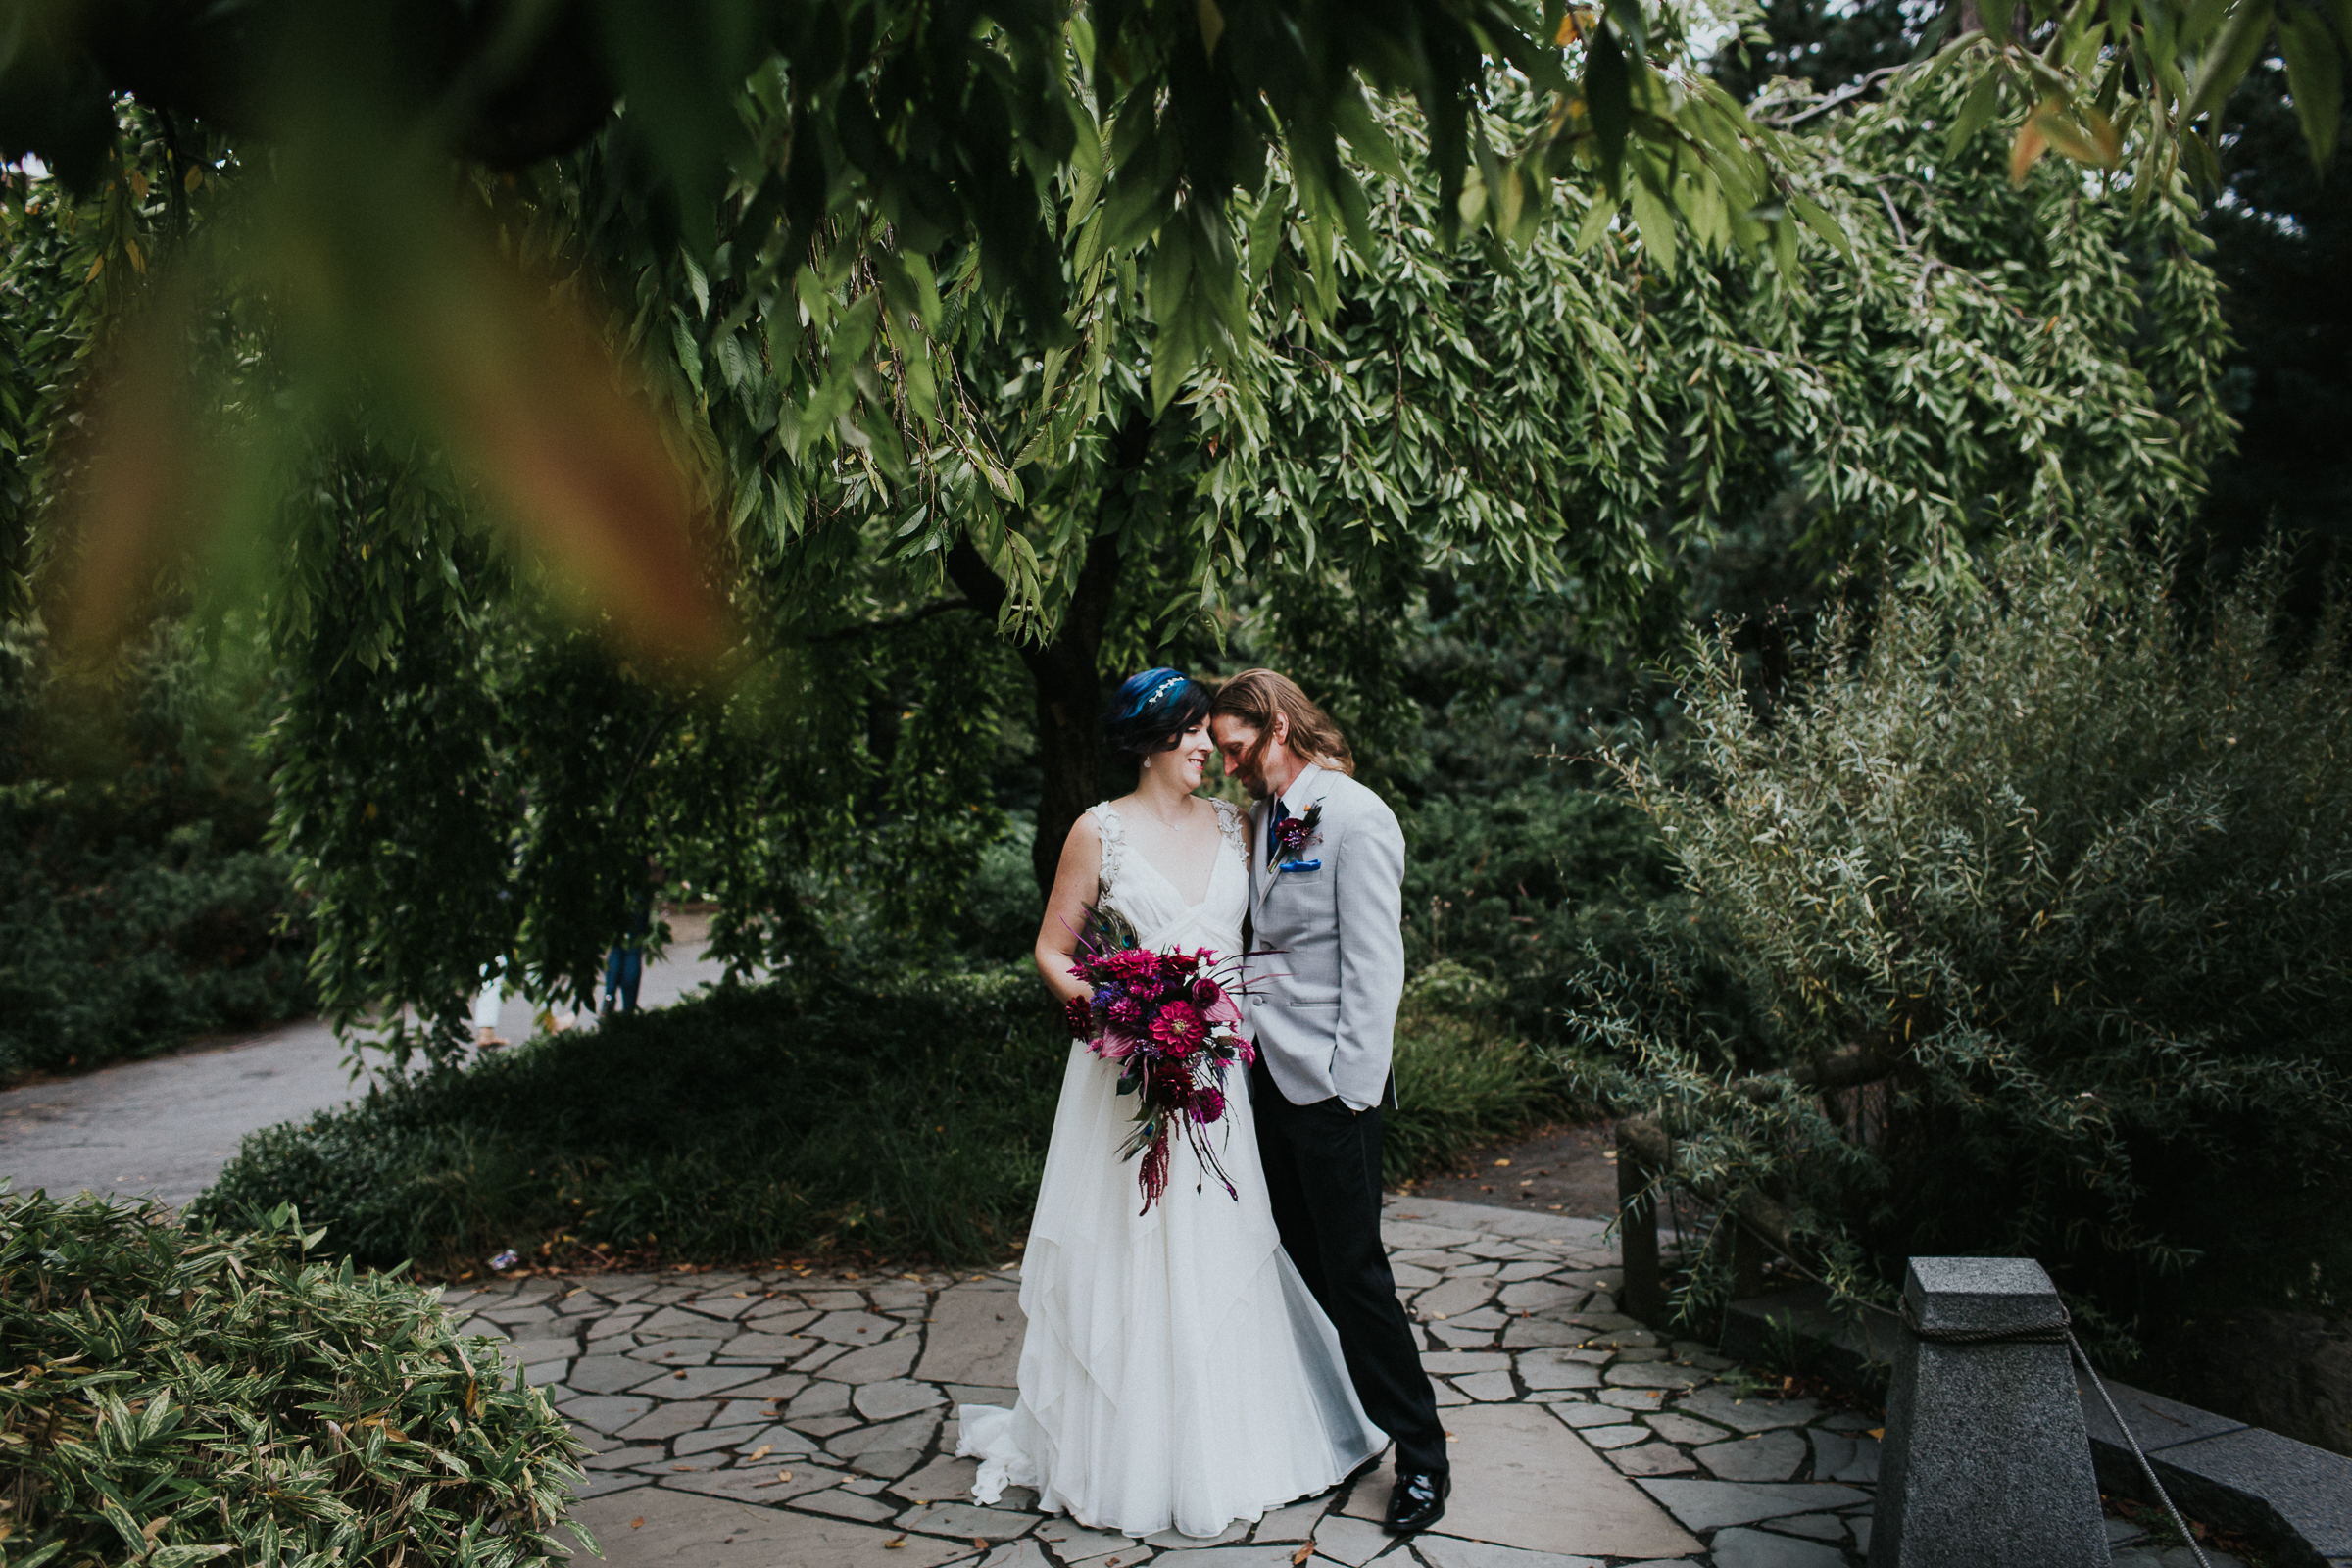 NYC-Brooklyn-Hotel-1-Botanic-Garden-Documentary-Wedding-Photographer-31.jpg